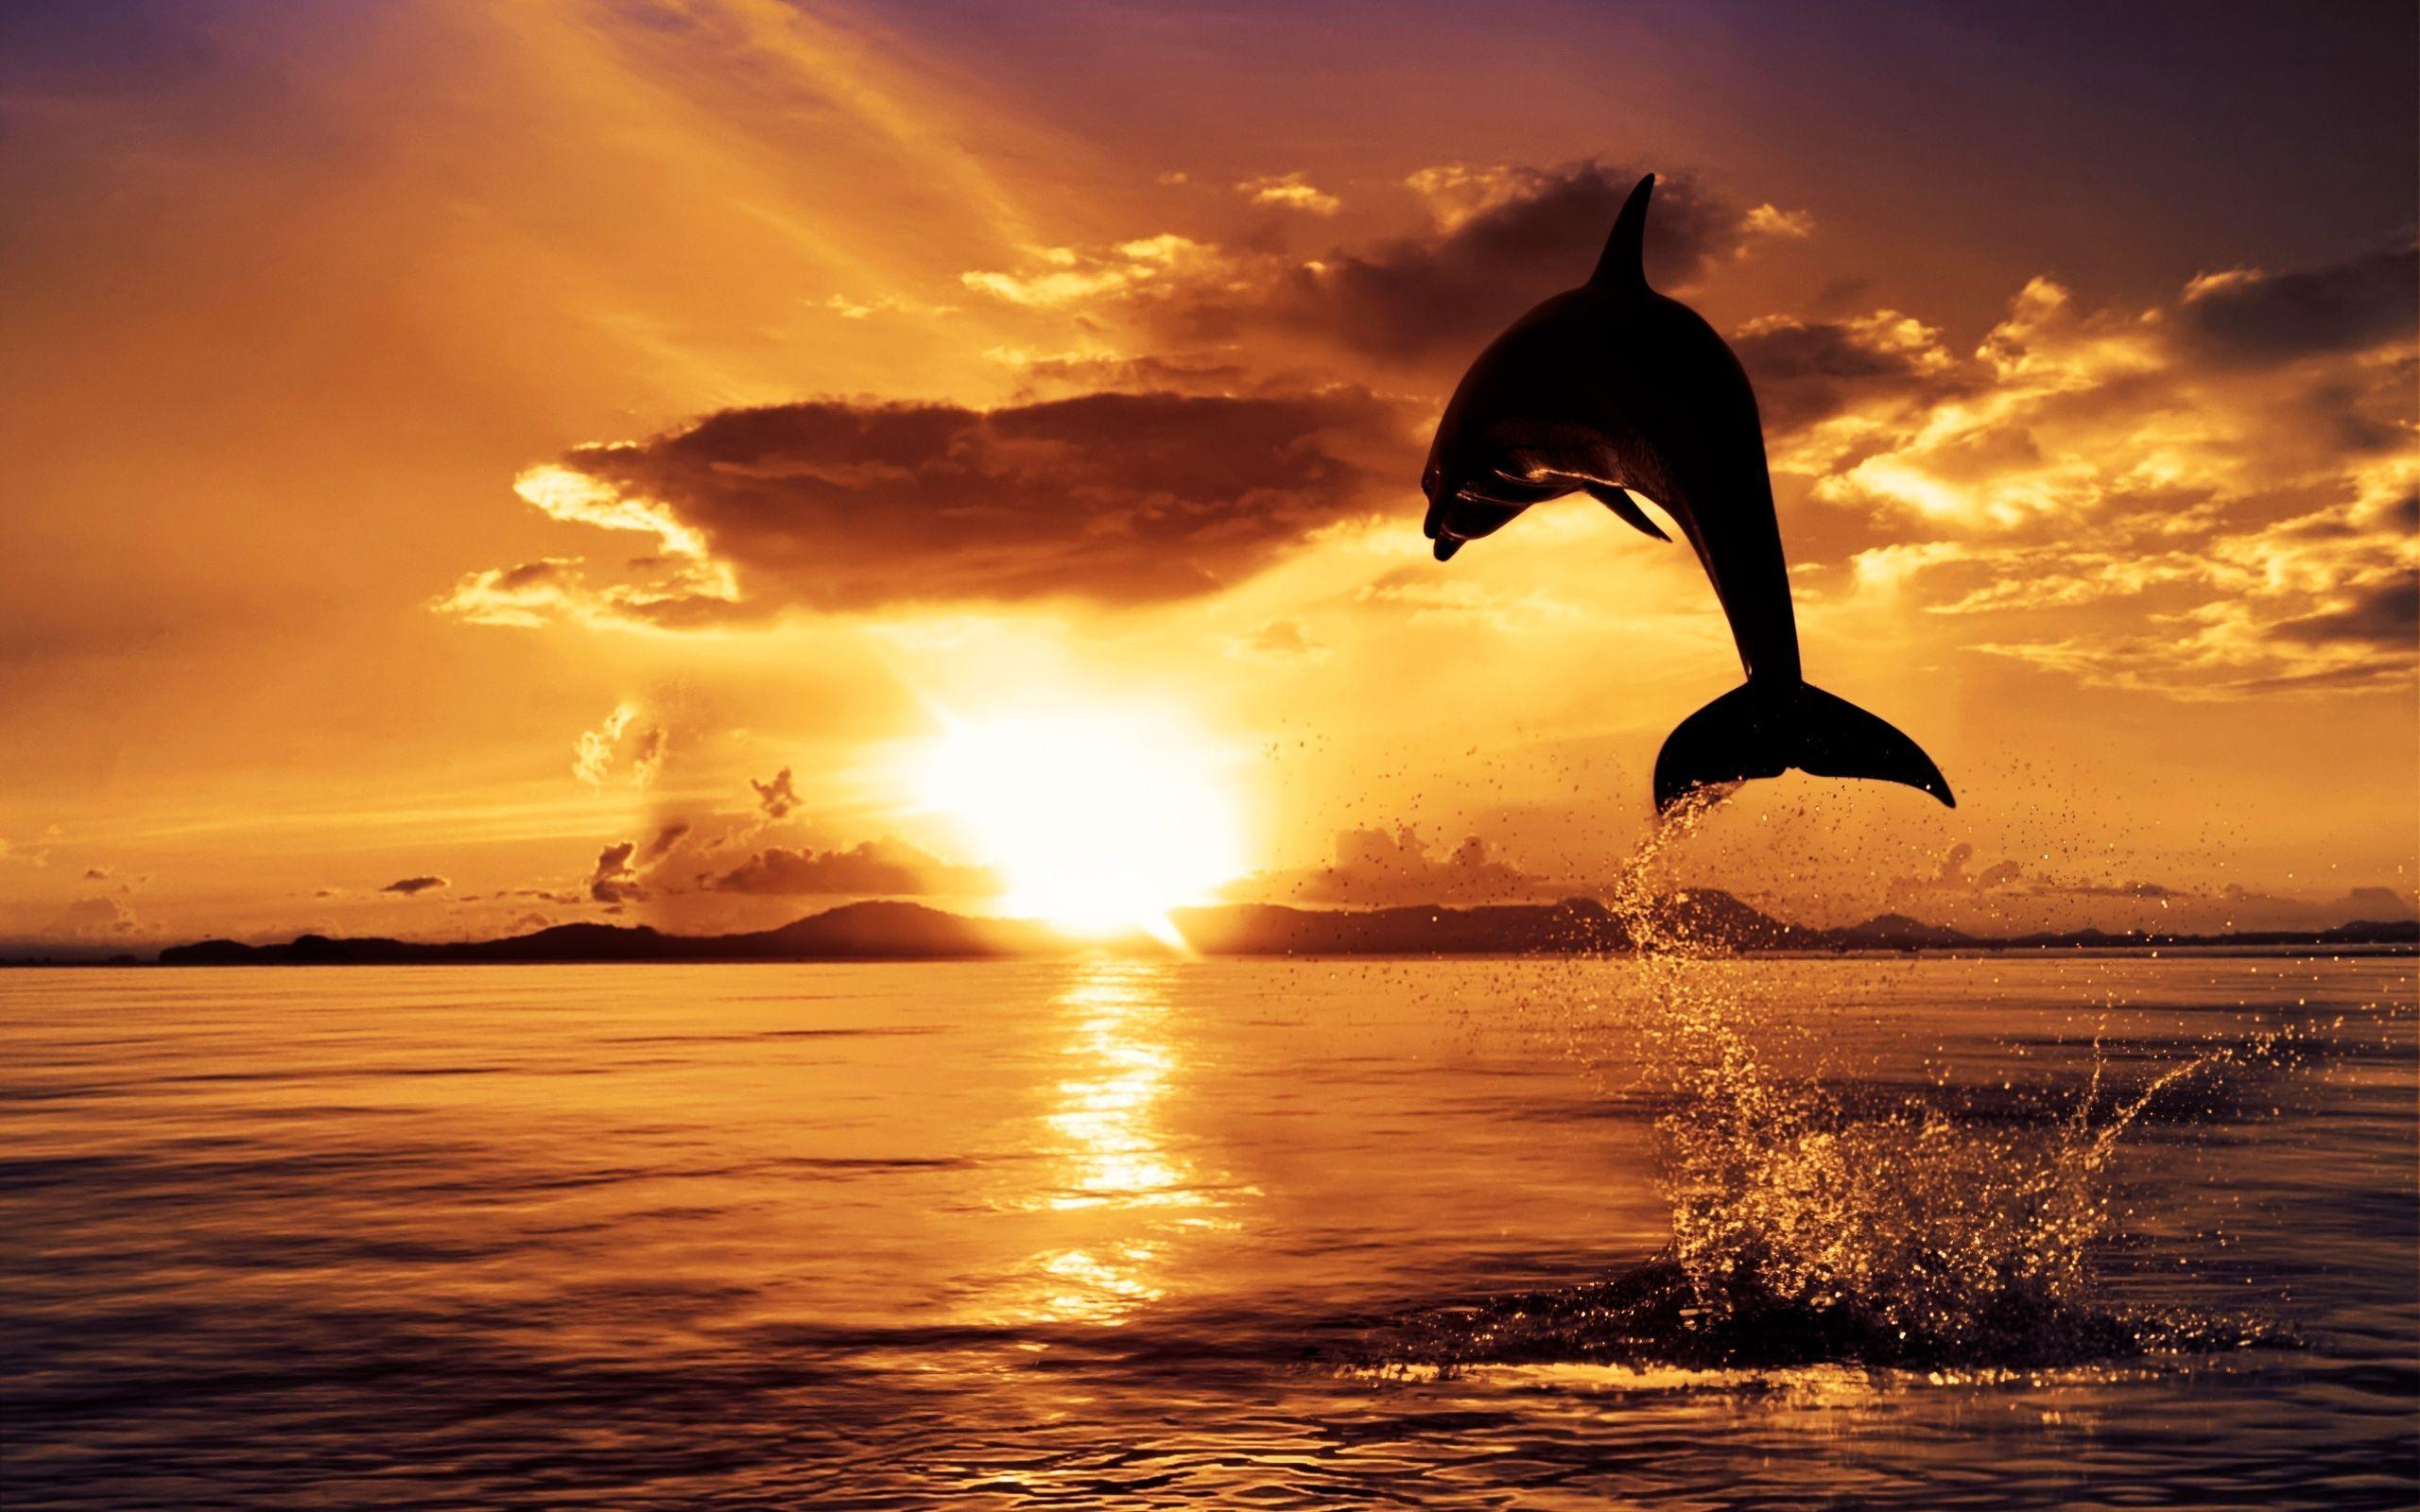 Beautiful Dolphin Jump Sunset Ocean HD Wallpaper 2560x1600